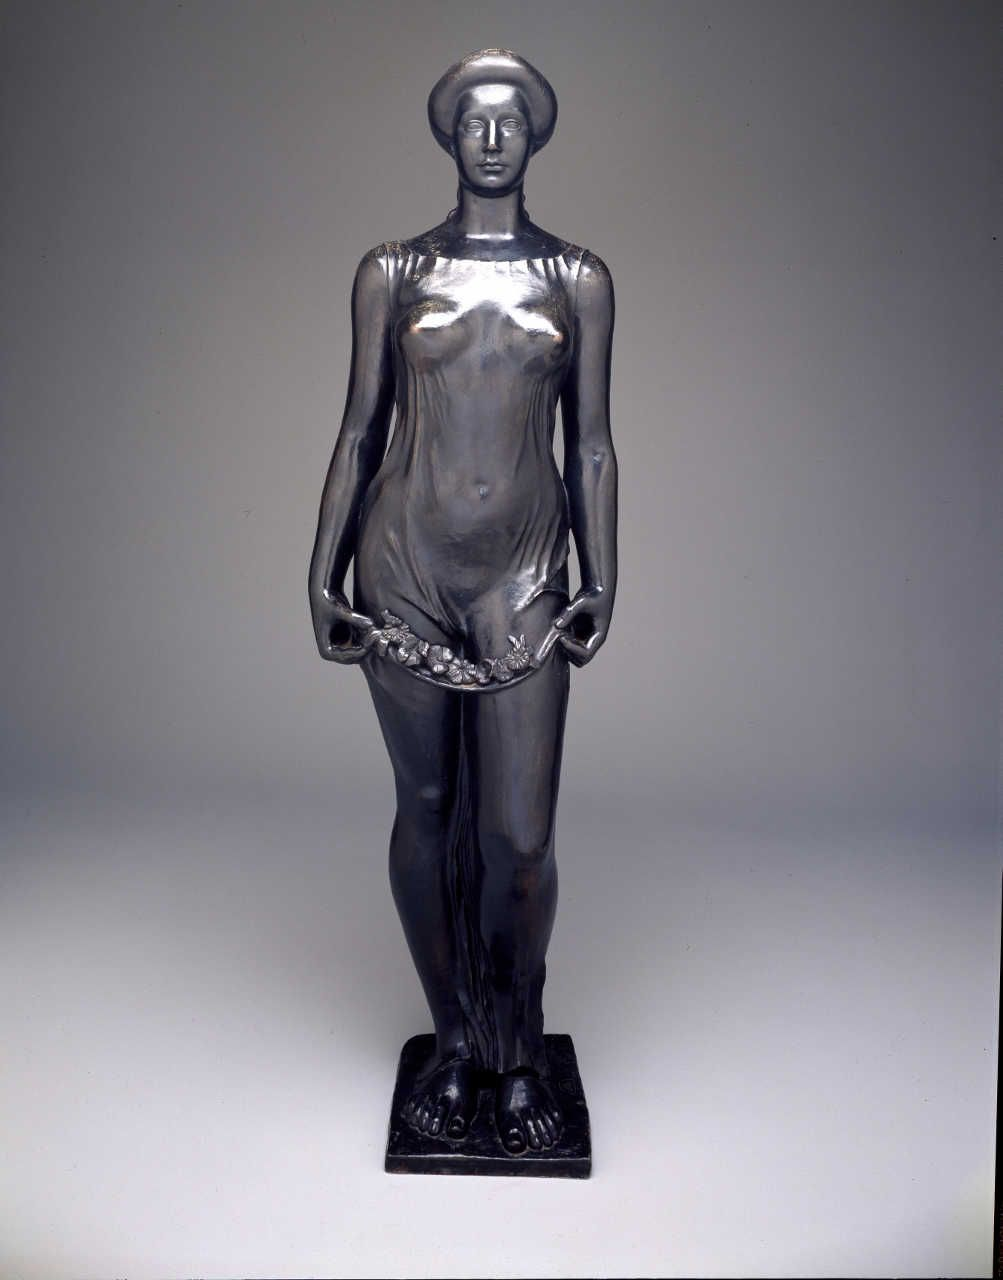 Aristide Maillol, Flora, 1911, 165,1 x 48,26 cm (Dallas Museum of Art)